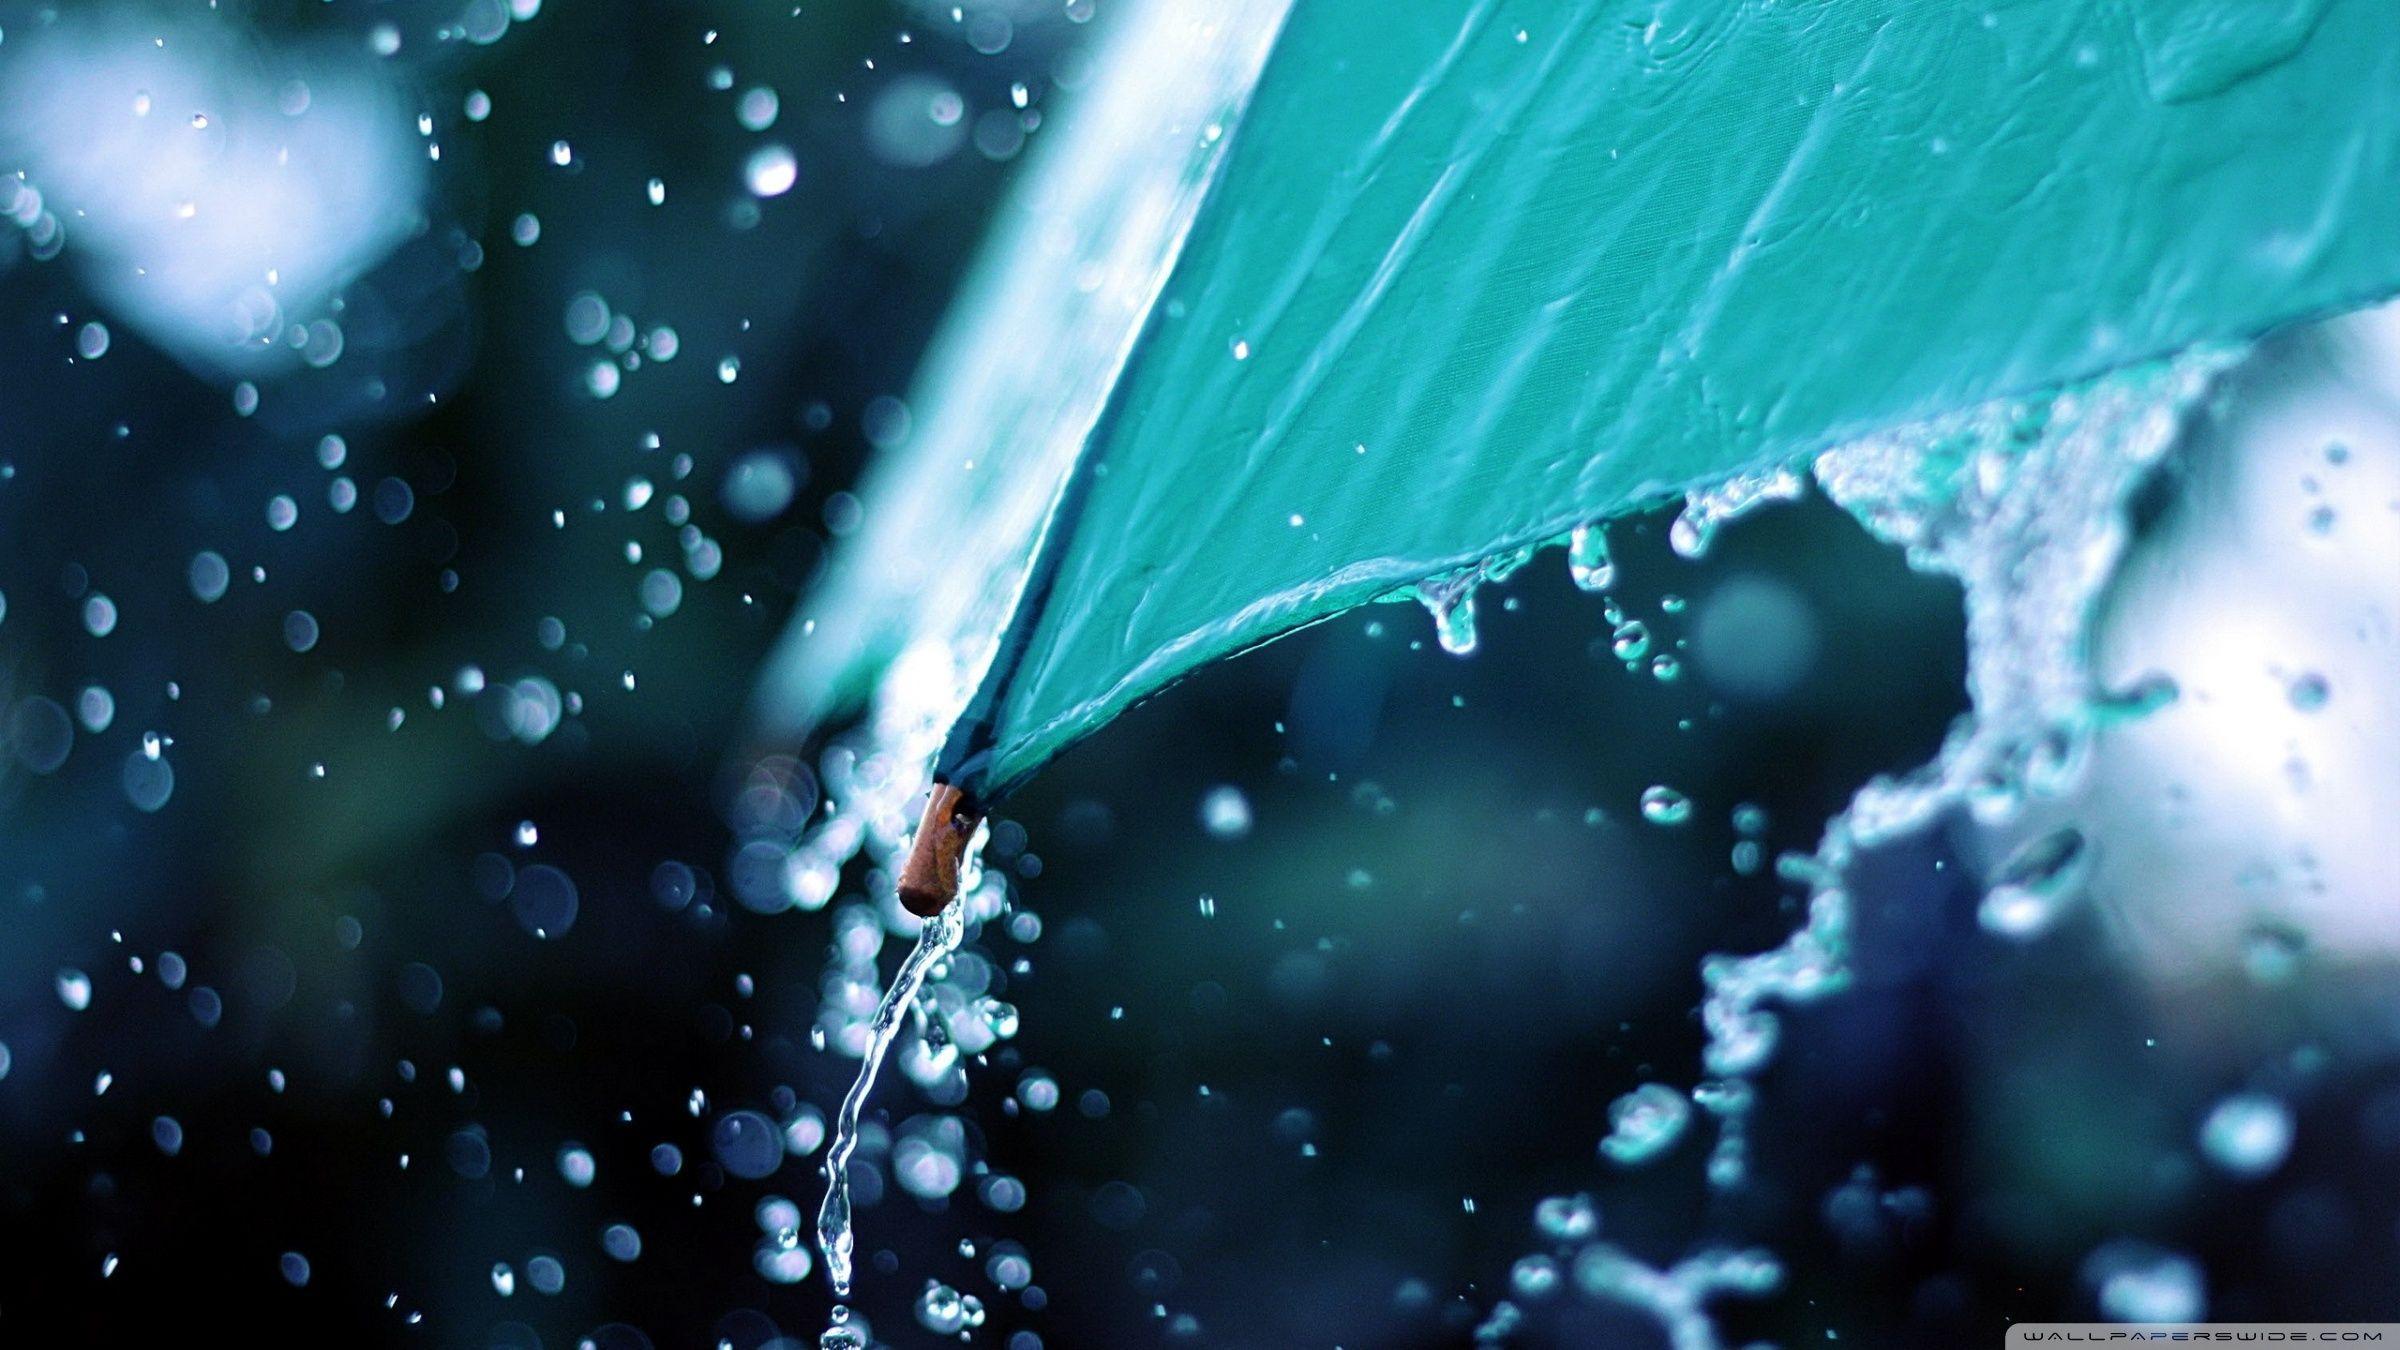 Rain Hd Desktop Wallpapers Top Free Rain Hd Desktop Backgrounds Wallpaperaccess